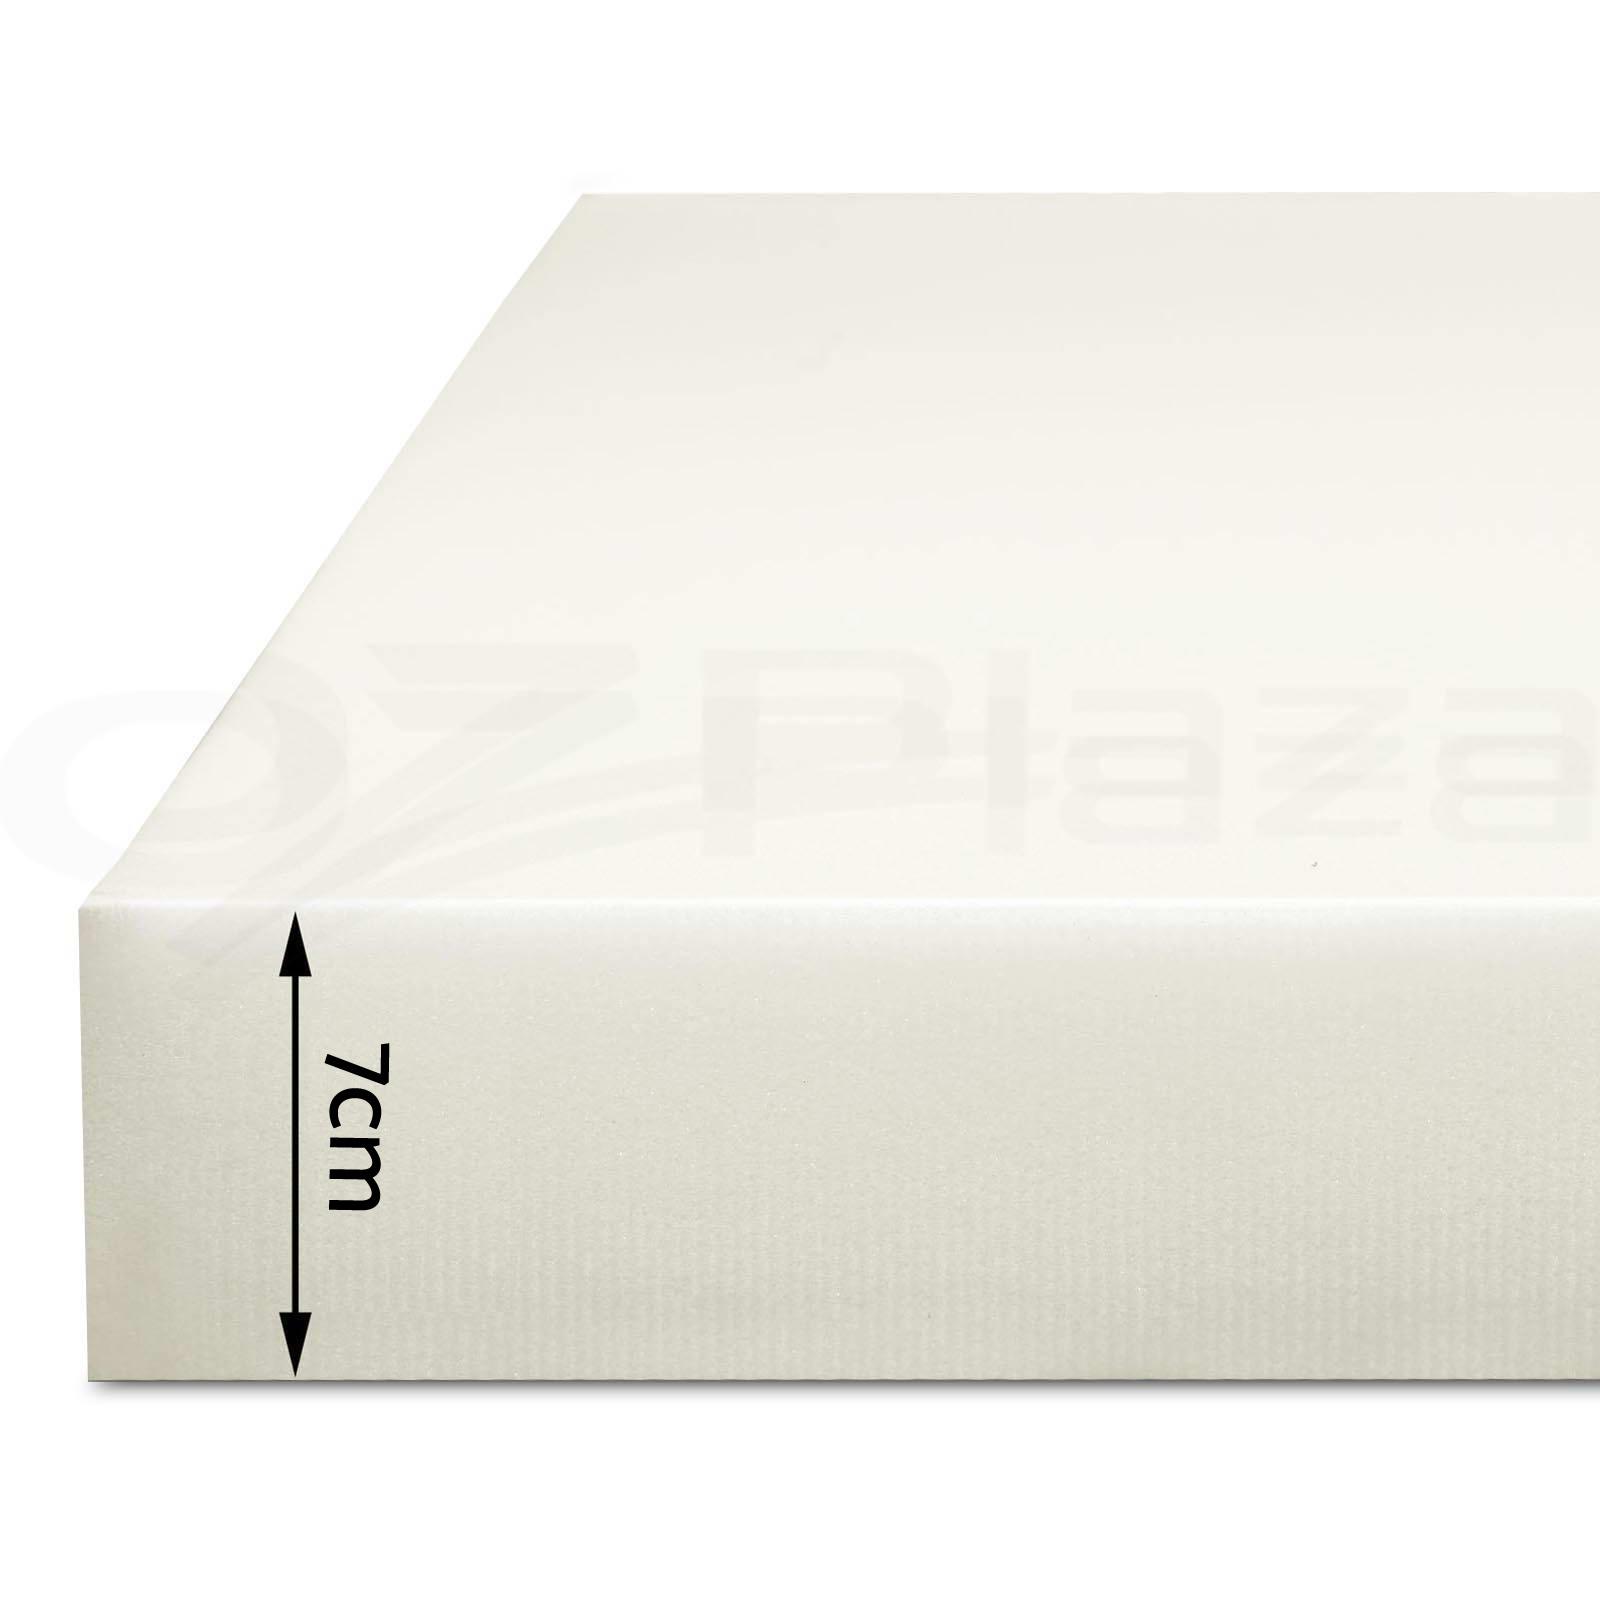 7CM-Memory-Foam-Mattress-Topper-BAMBOO-Fabric-Underlay-